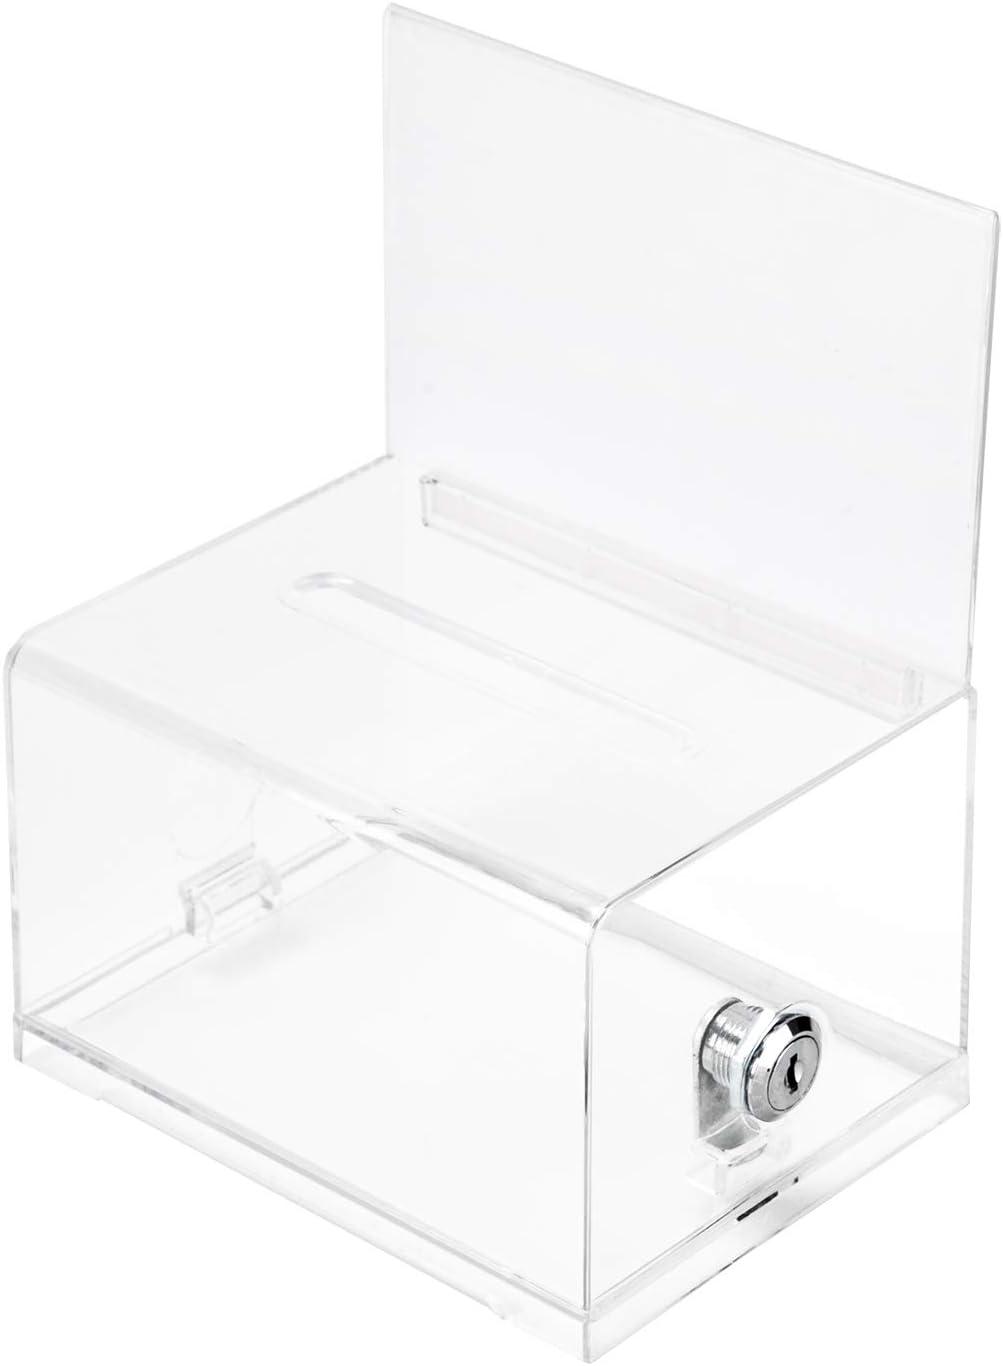 Long Beach Mall Amazon Basics Clear Ballot Box With Brand new Lock